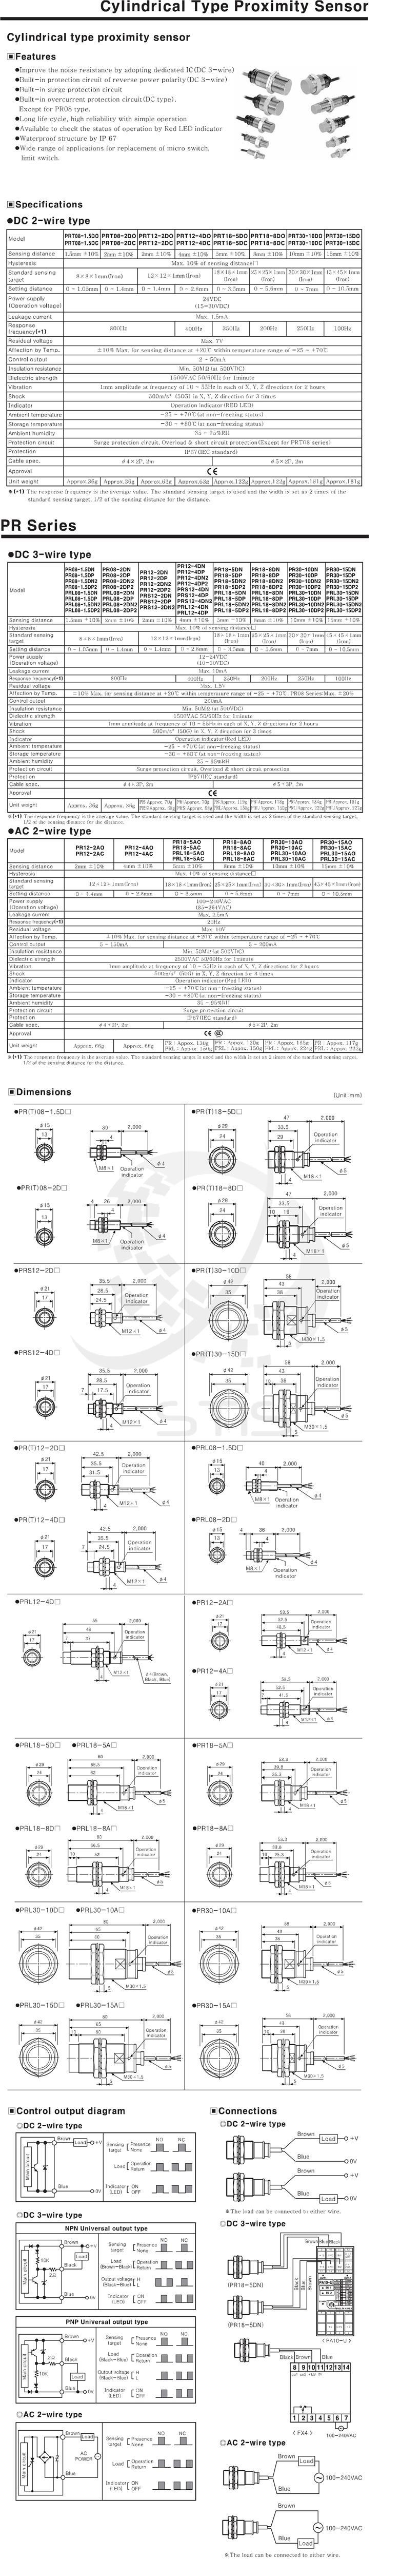 Autonics Inductive Proximity Sensor End 11 7 2016 415 Pm 3 Wire Wiring Diagram Pr30 15dn